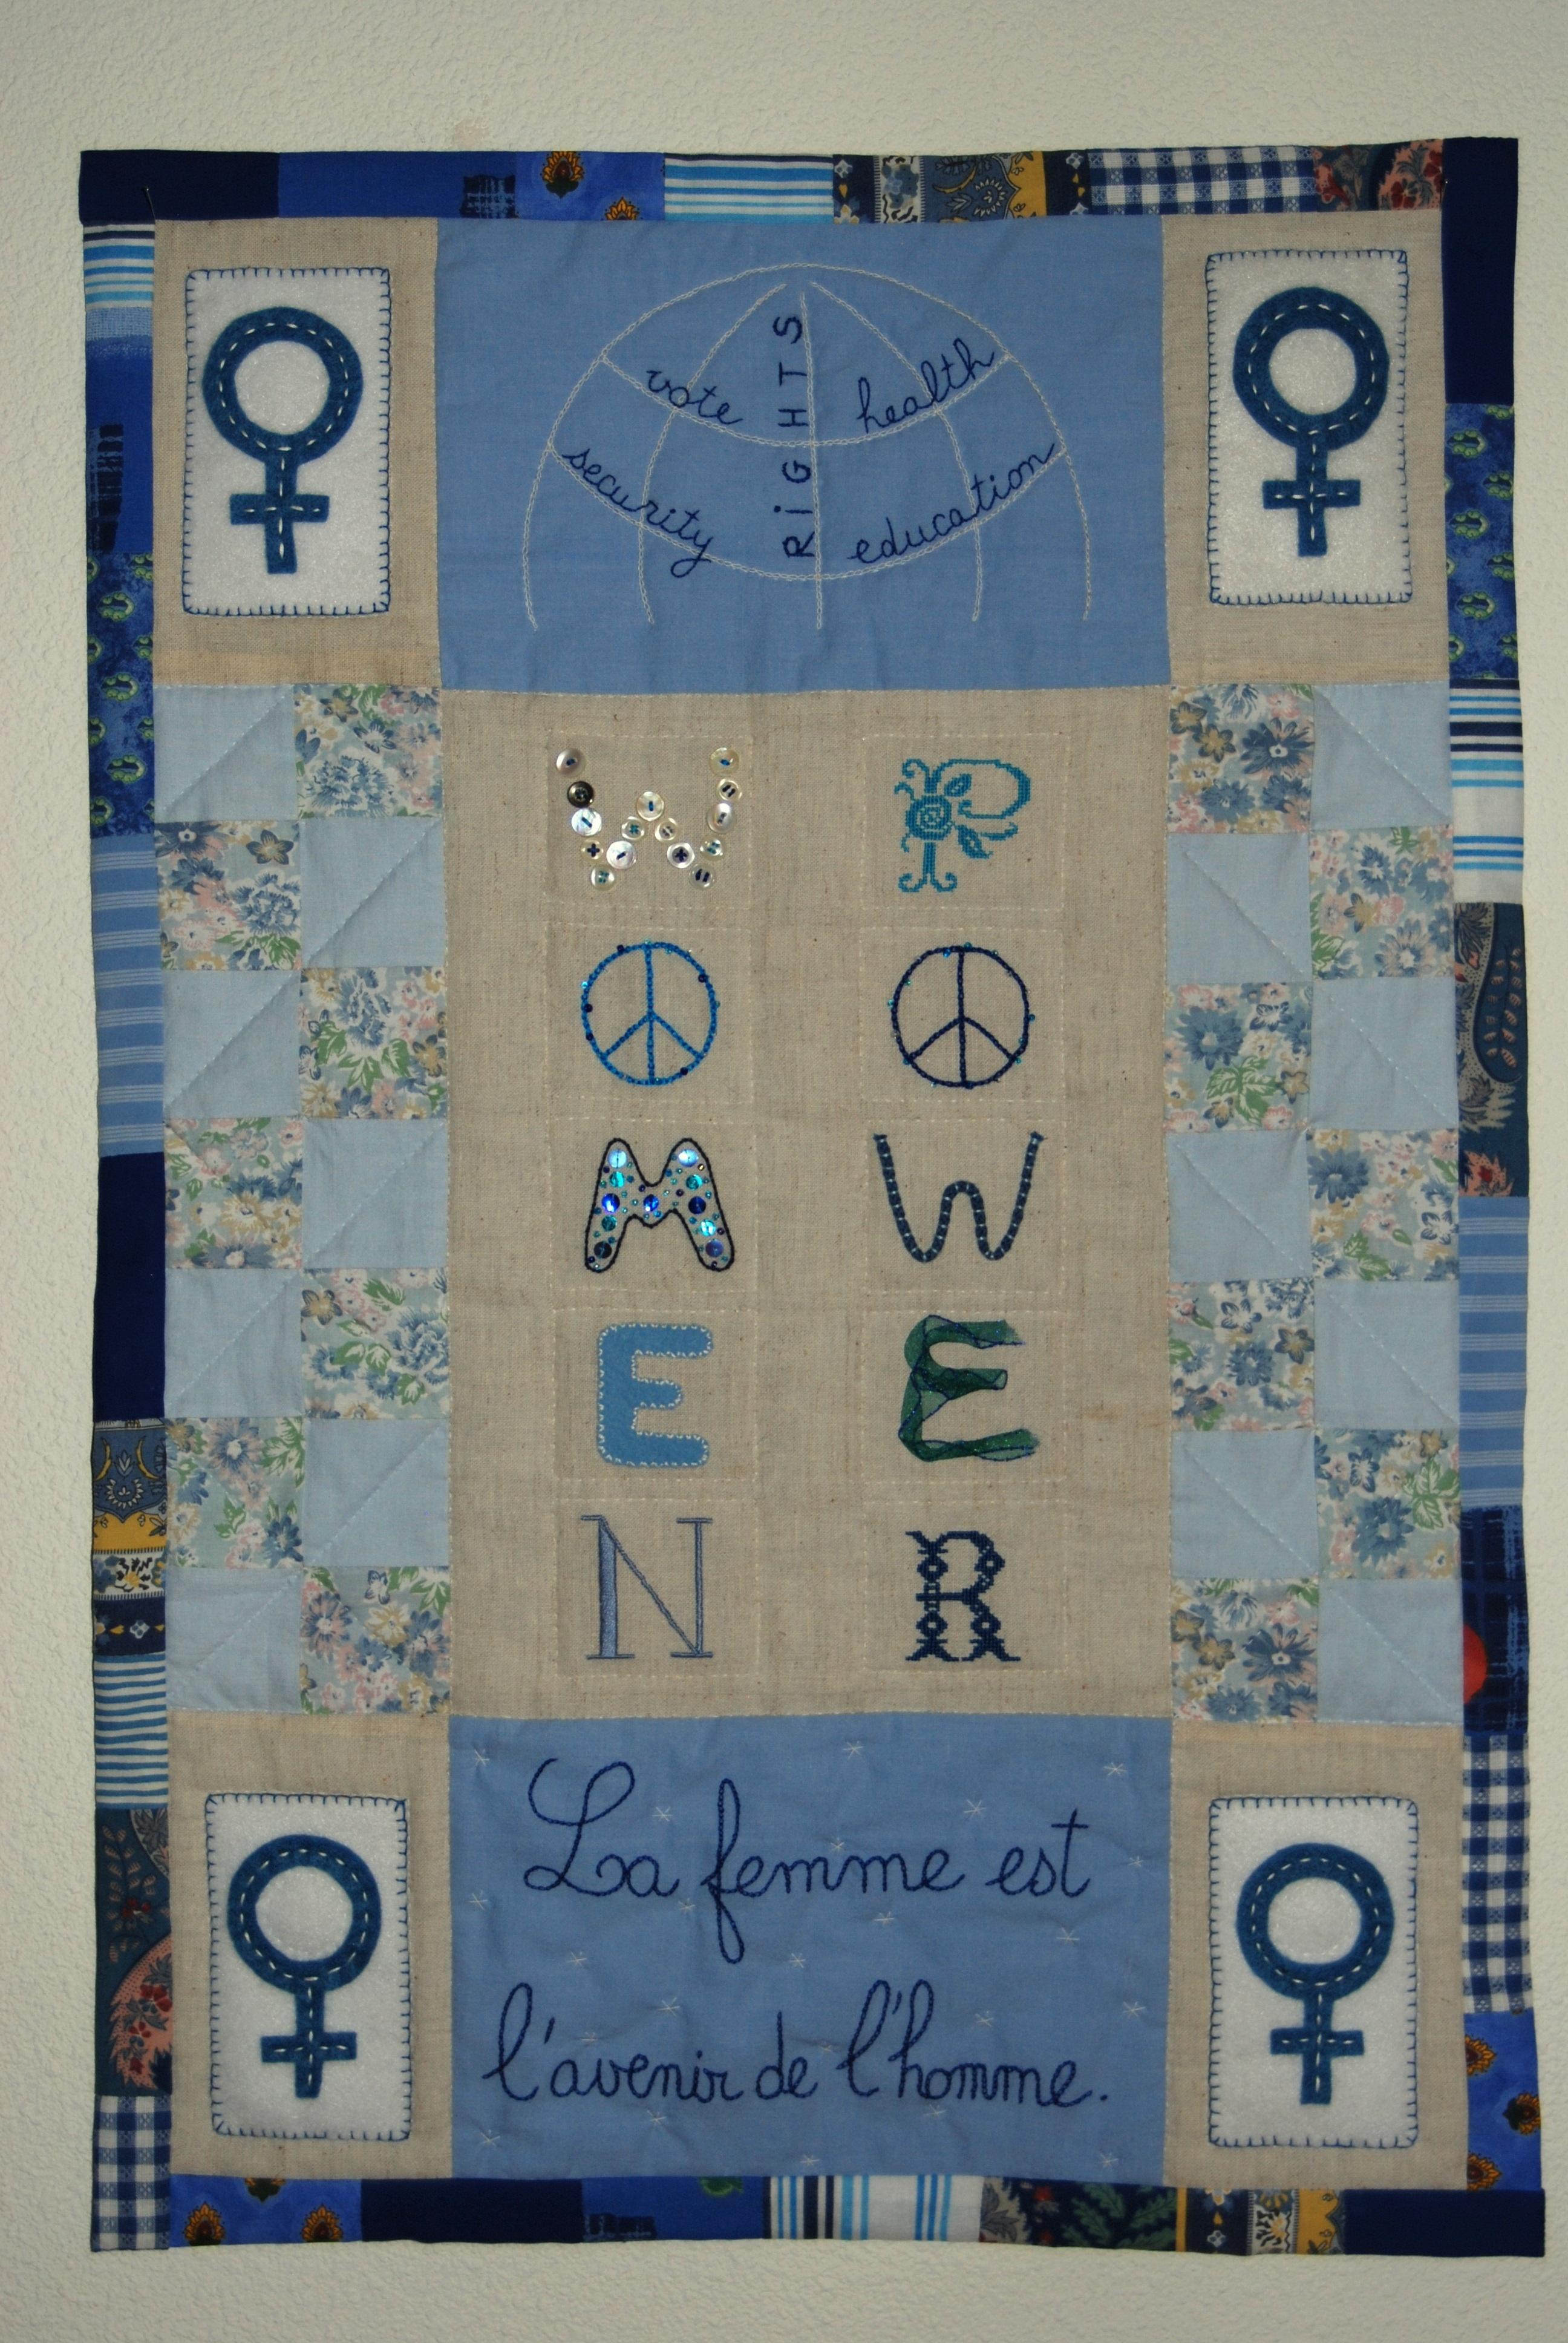 Women Power by Corrine Beque